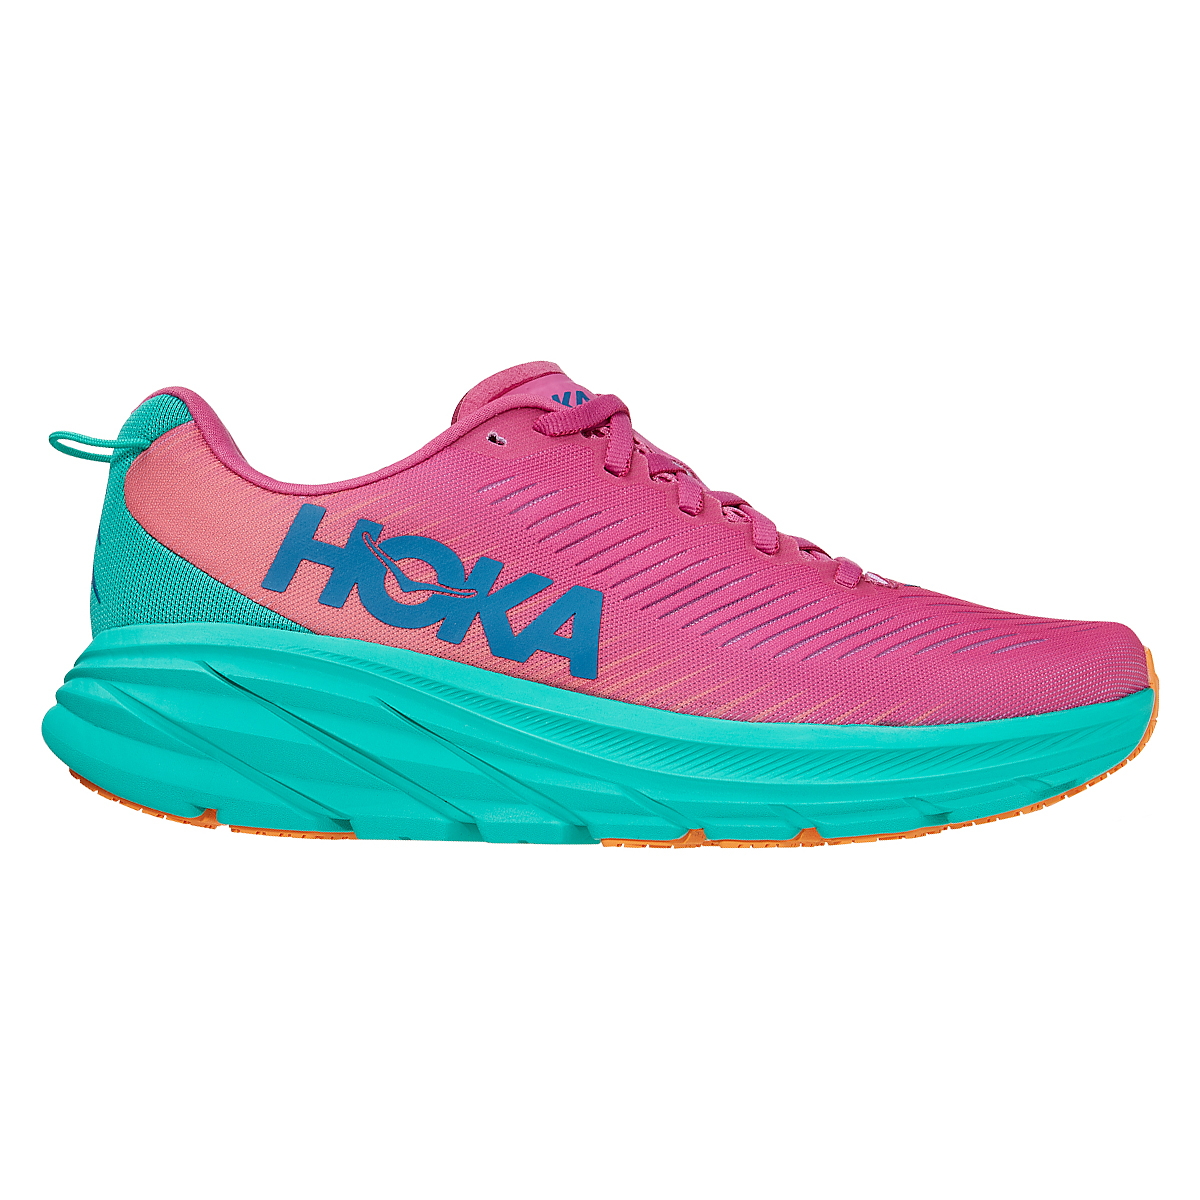 Women's Hoka One One Rincon 3 Running Shoe - Color: Phlox Pink/Atlantis - Size: 5 - Width: Regular, Phlox Pink/Atlantis, large, image 1